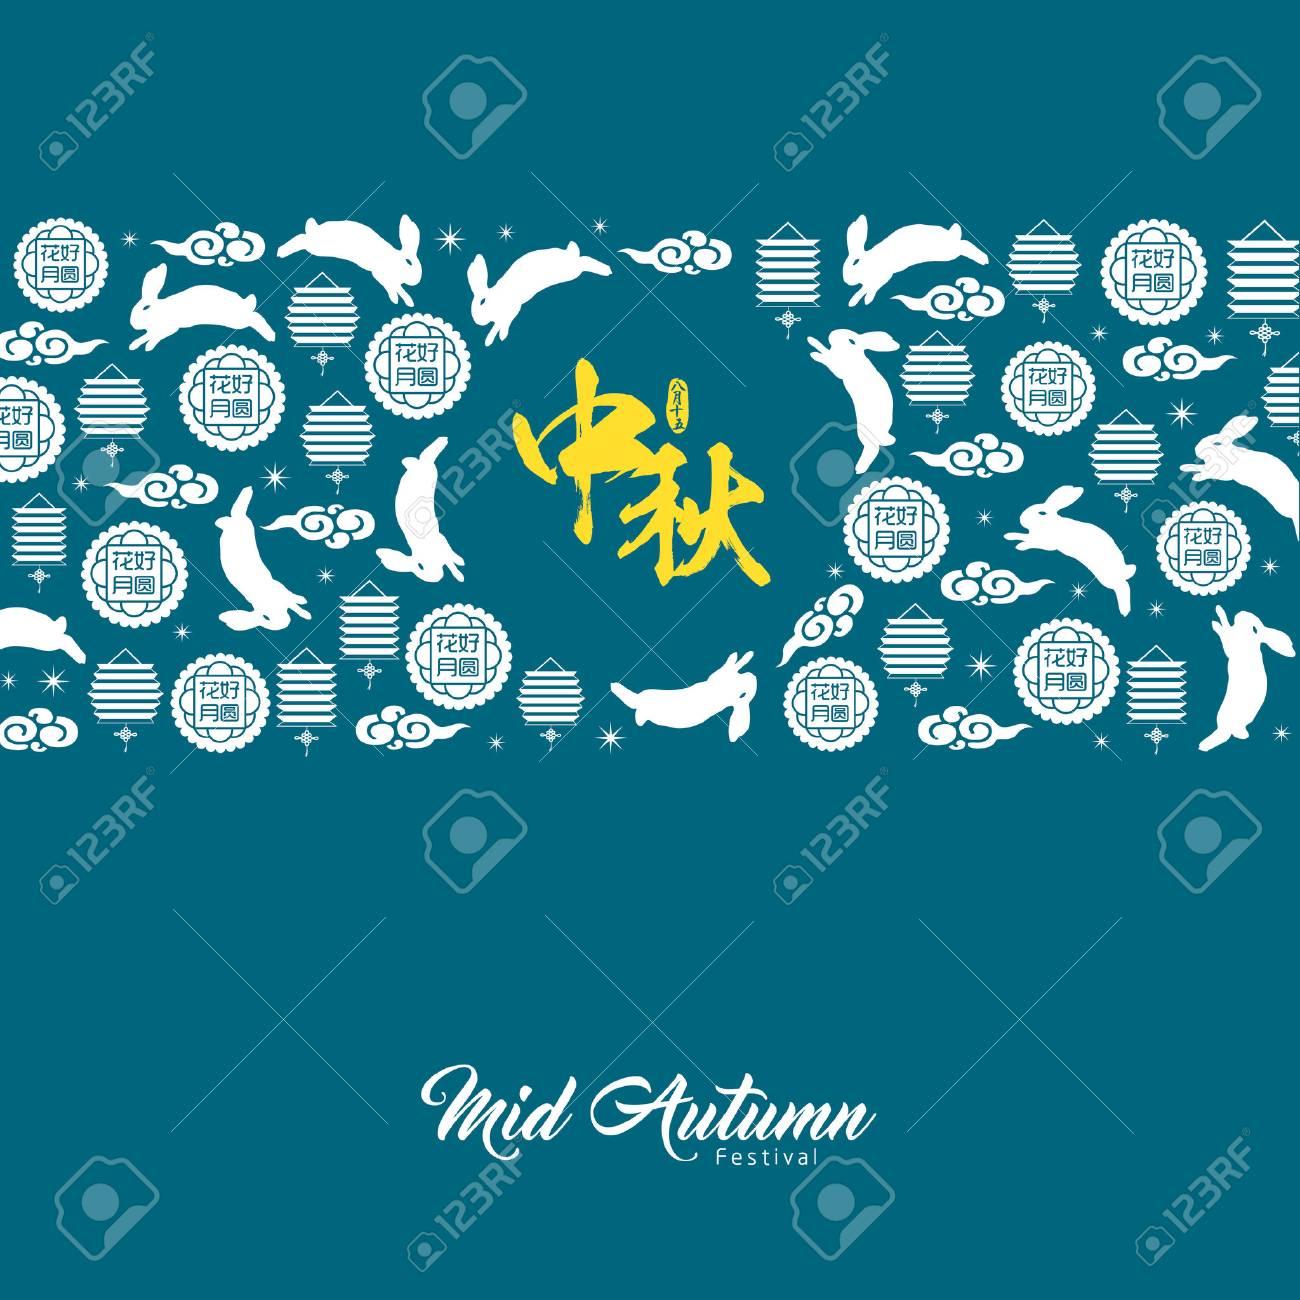 Mid-autumn festival illustration with bunny, moon cakes, lantern and cloud element. Caption: Mid-autumn festival, 15th august - 85034079